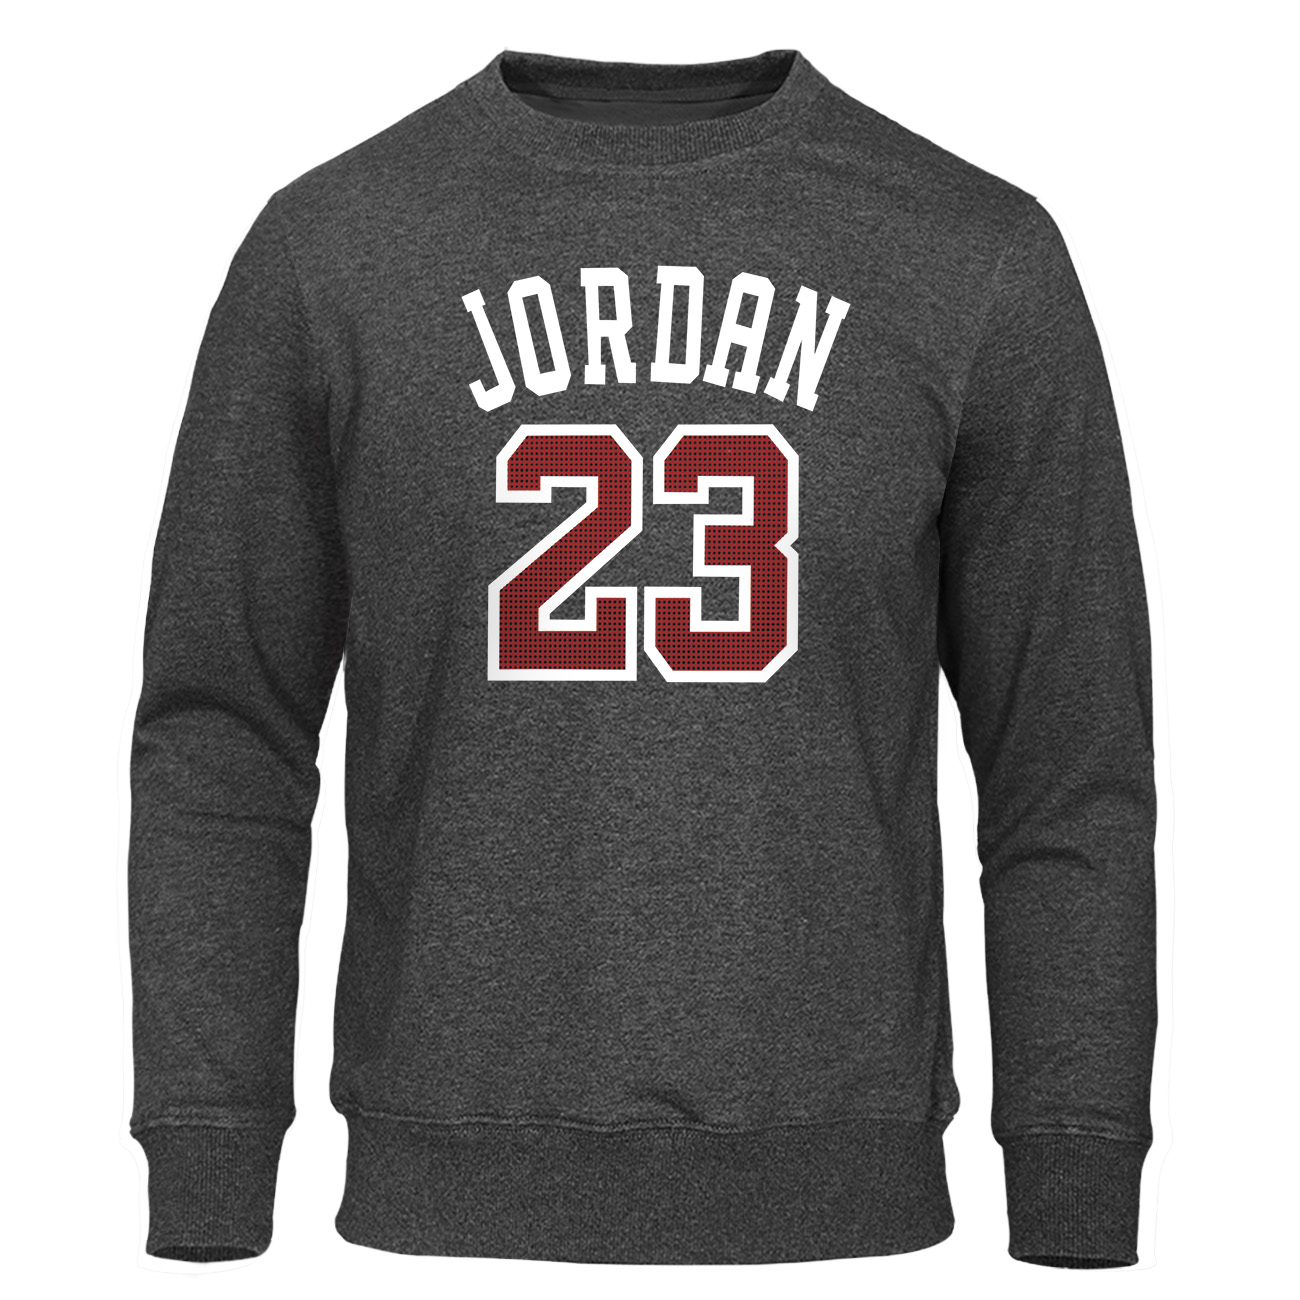 Men Hoodie 2019 Spring Autumn New Hot Sale New Tops Jordan 23 Print Streetwear Sweatshirts Cotten Men Hoodies Hip Hot Pullovers